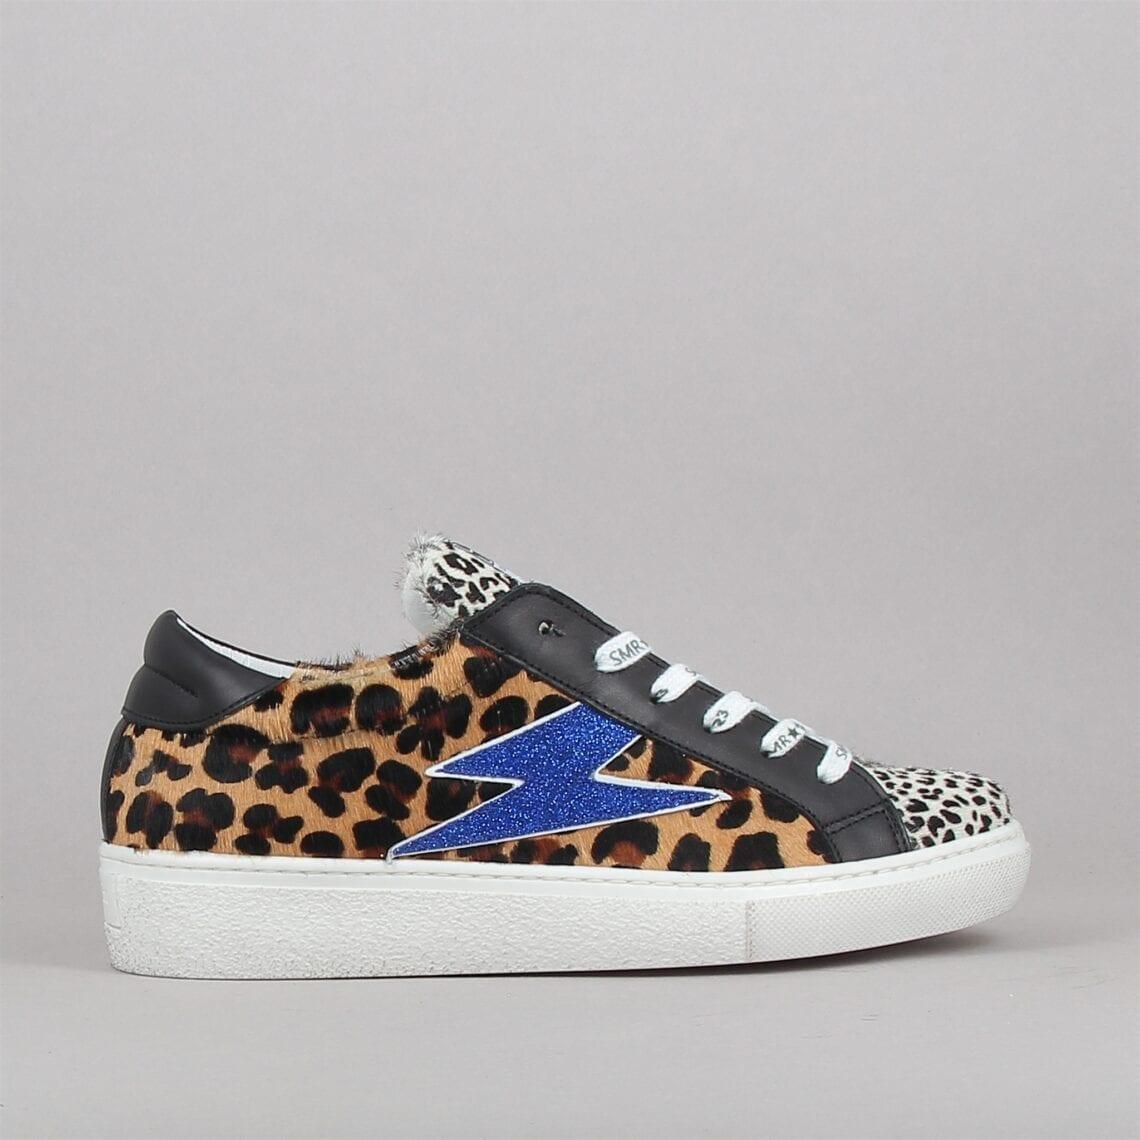 riz-2417-leopard-185434114-0.jpg